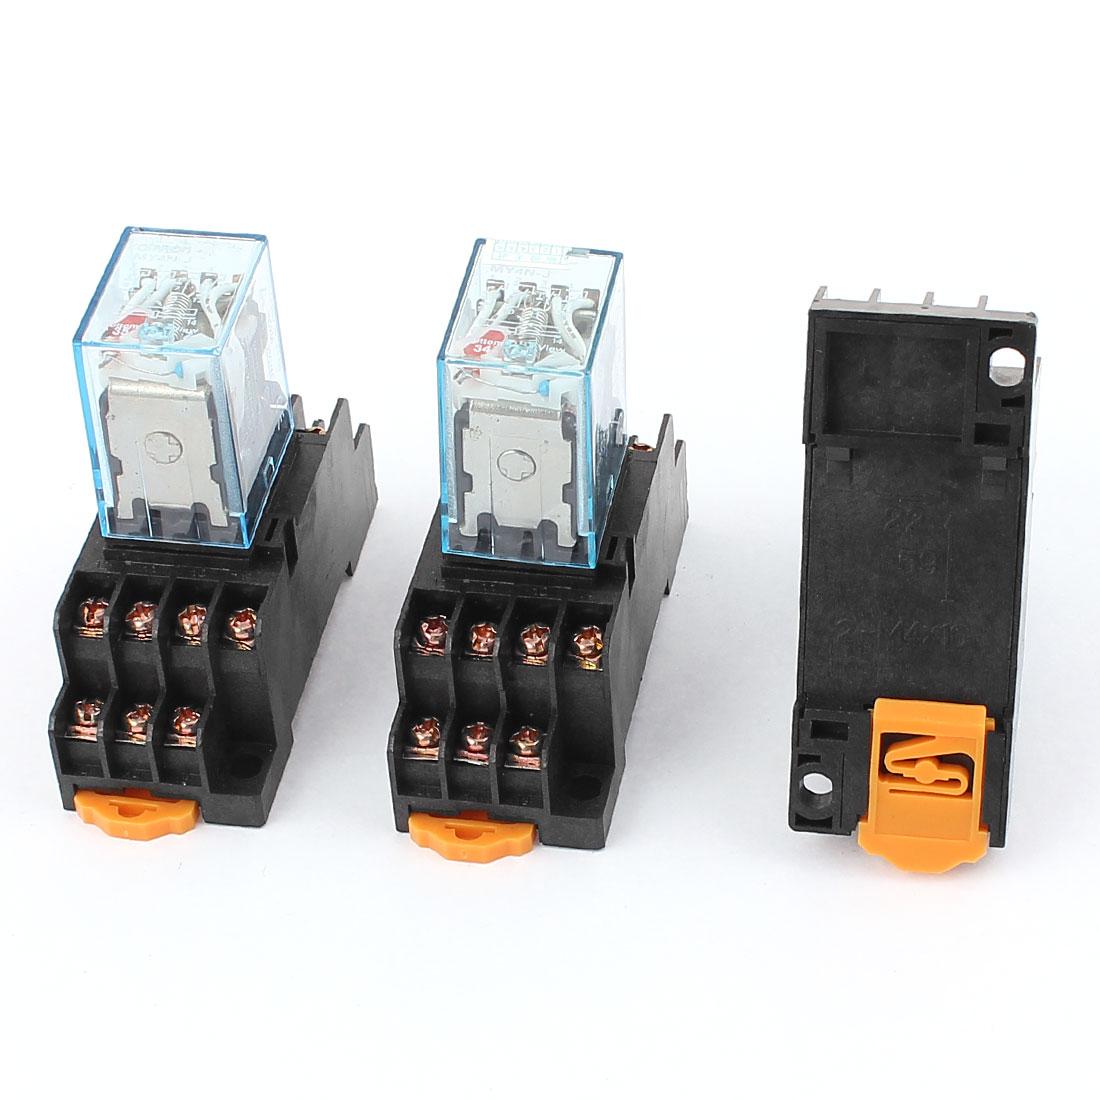 3pcs AC 220/240V Coil Voltage 14 Terminals 35mm DIN Rail Mount 4PDT Power Electromagnetic Relay w Socket